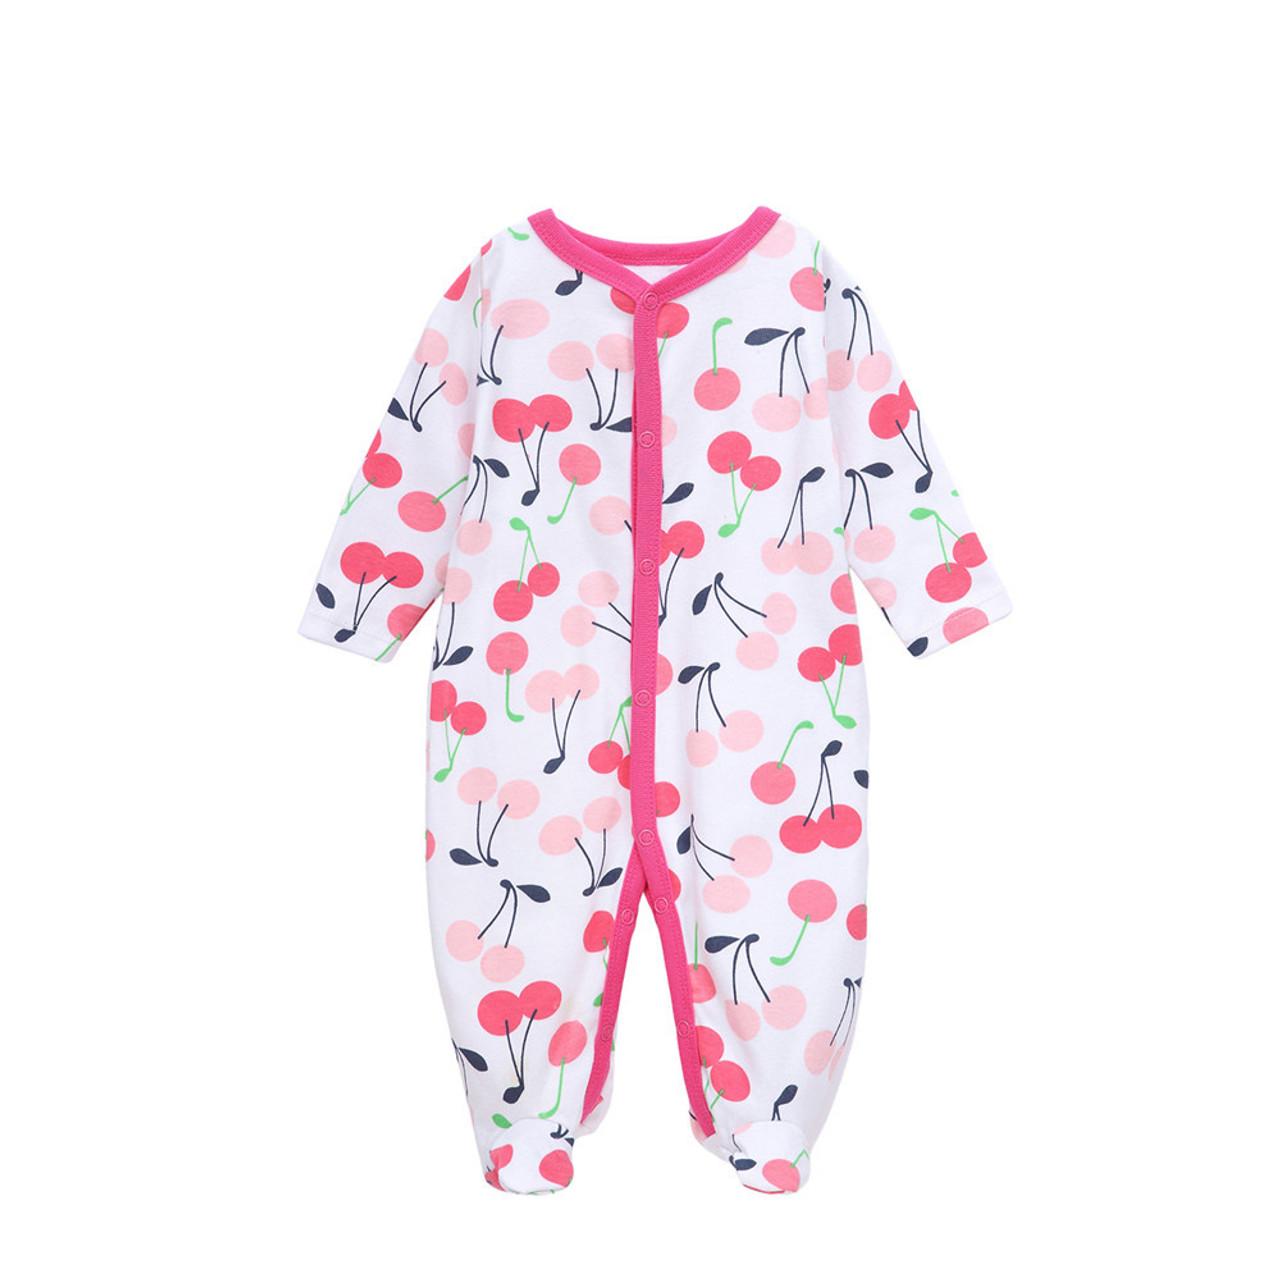 a726c325c2f0 6Pcs Newborn Baby Girl Romper Winter Baby Boy Jumpsuit 100% Cotton ...